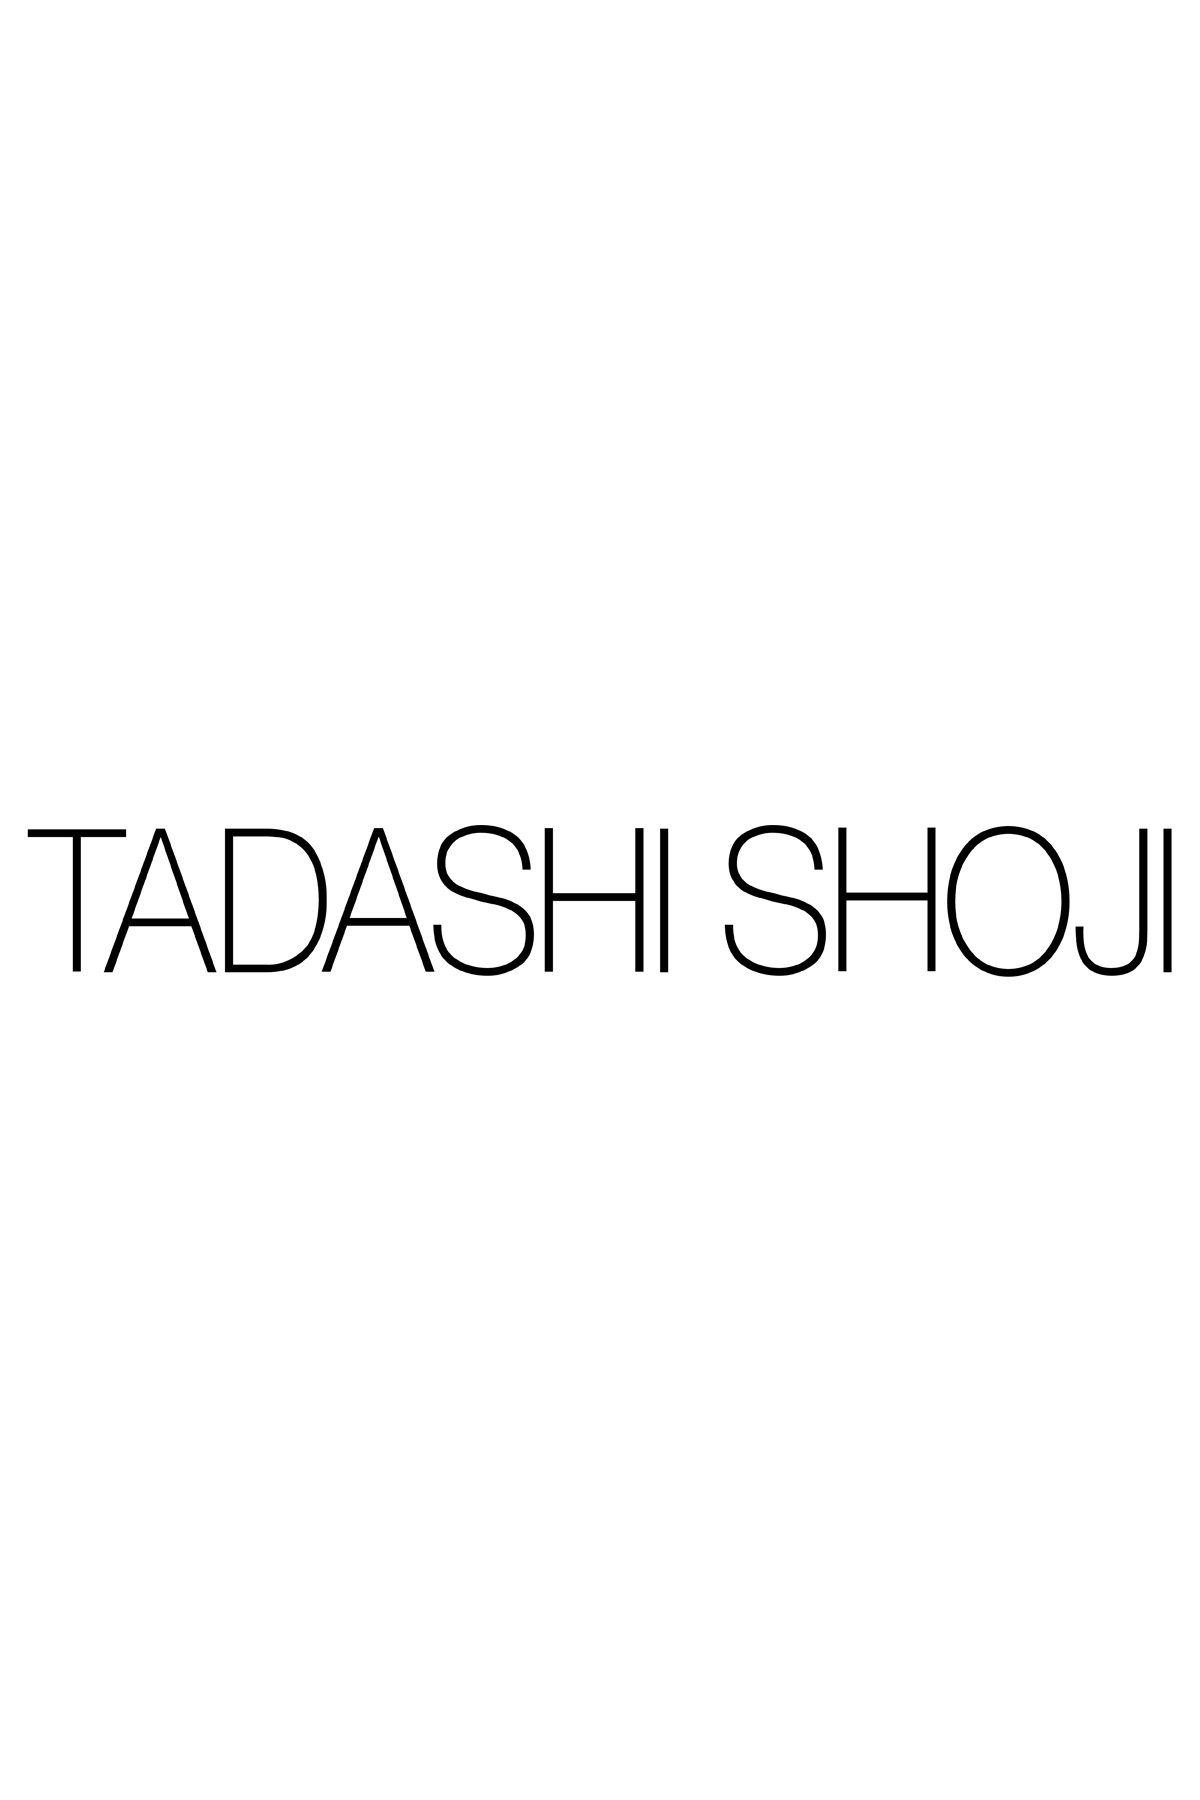 Tadashi Shoji x Bel Aire Bridal - Dramatic Clip of Sparkling Rhinestones